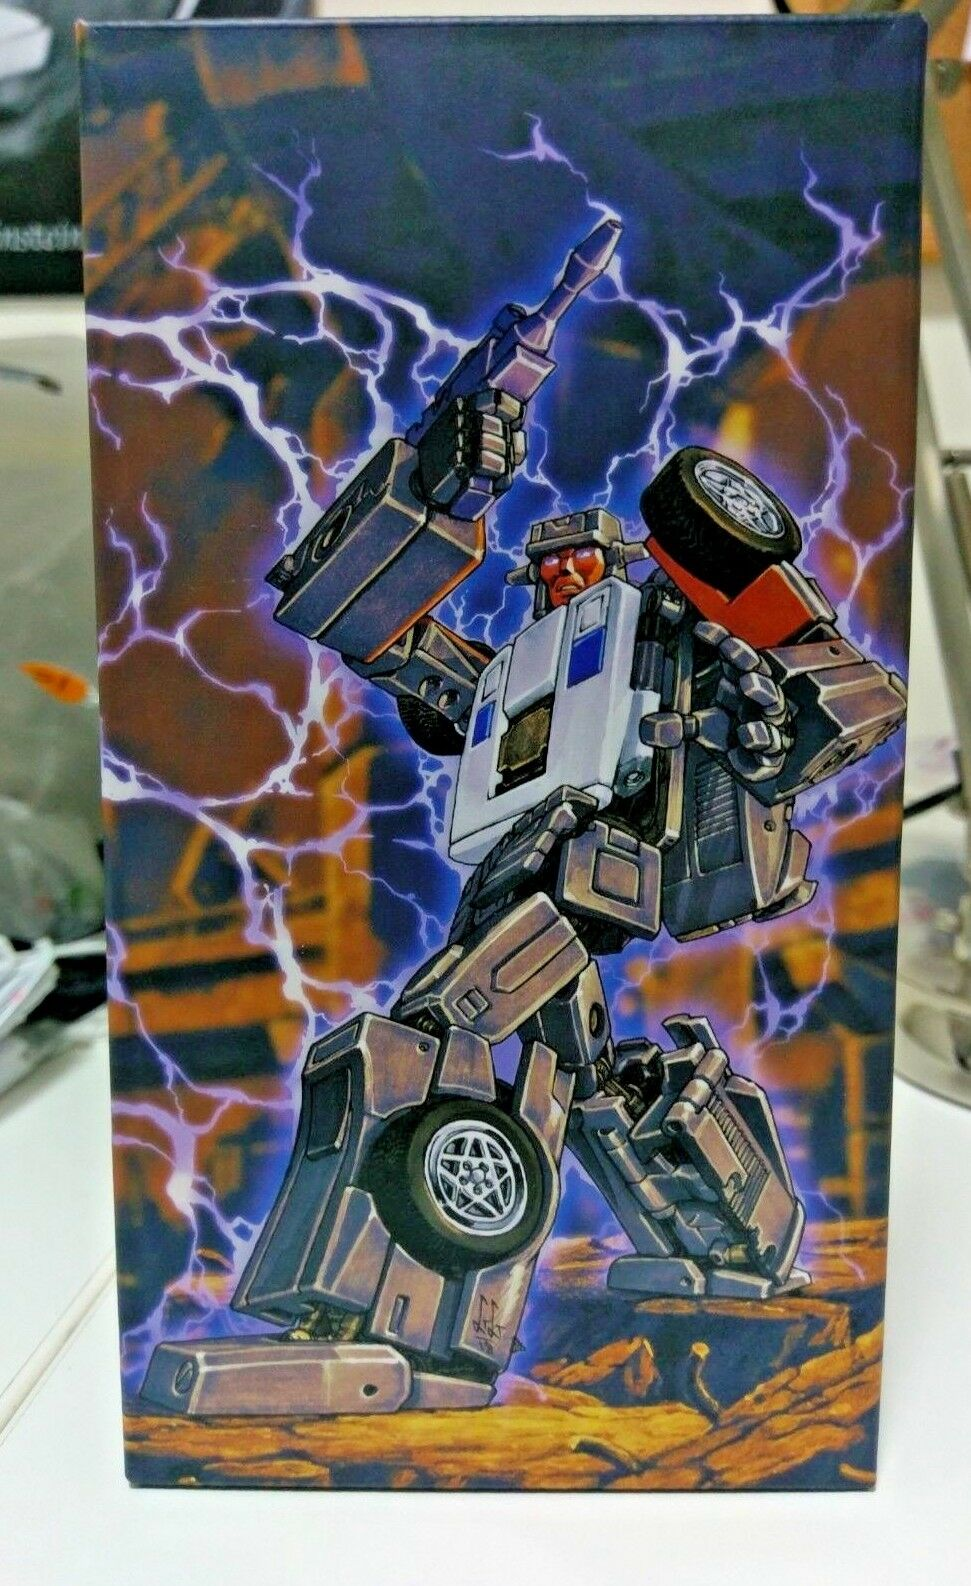 X transbots x-transbot monolith sammler mx-xiv mx-14 flipout wildrider menasor